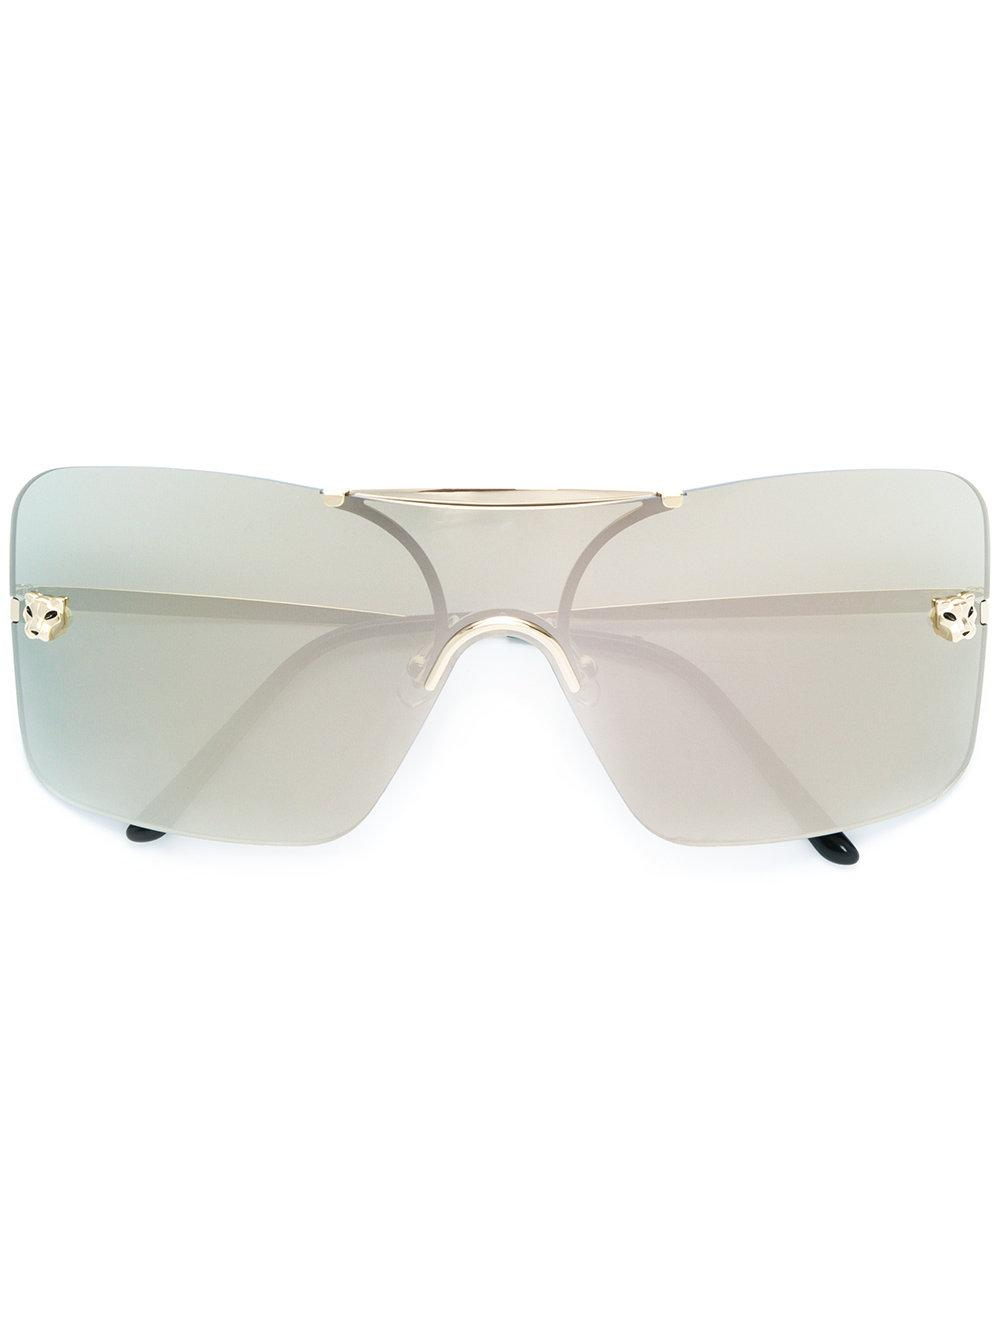 f70726a05f Cartier PanthèRe De Sunglasses - Metallic